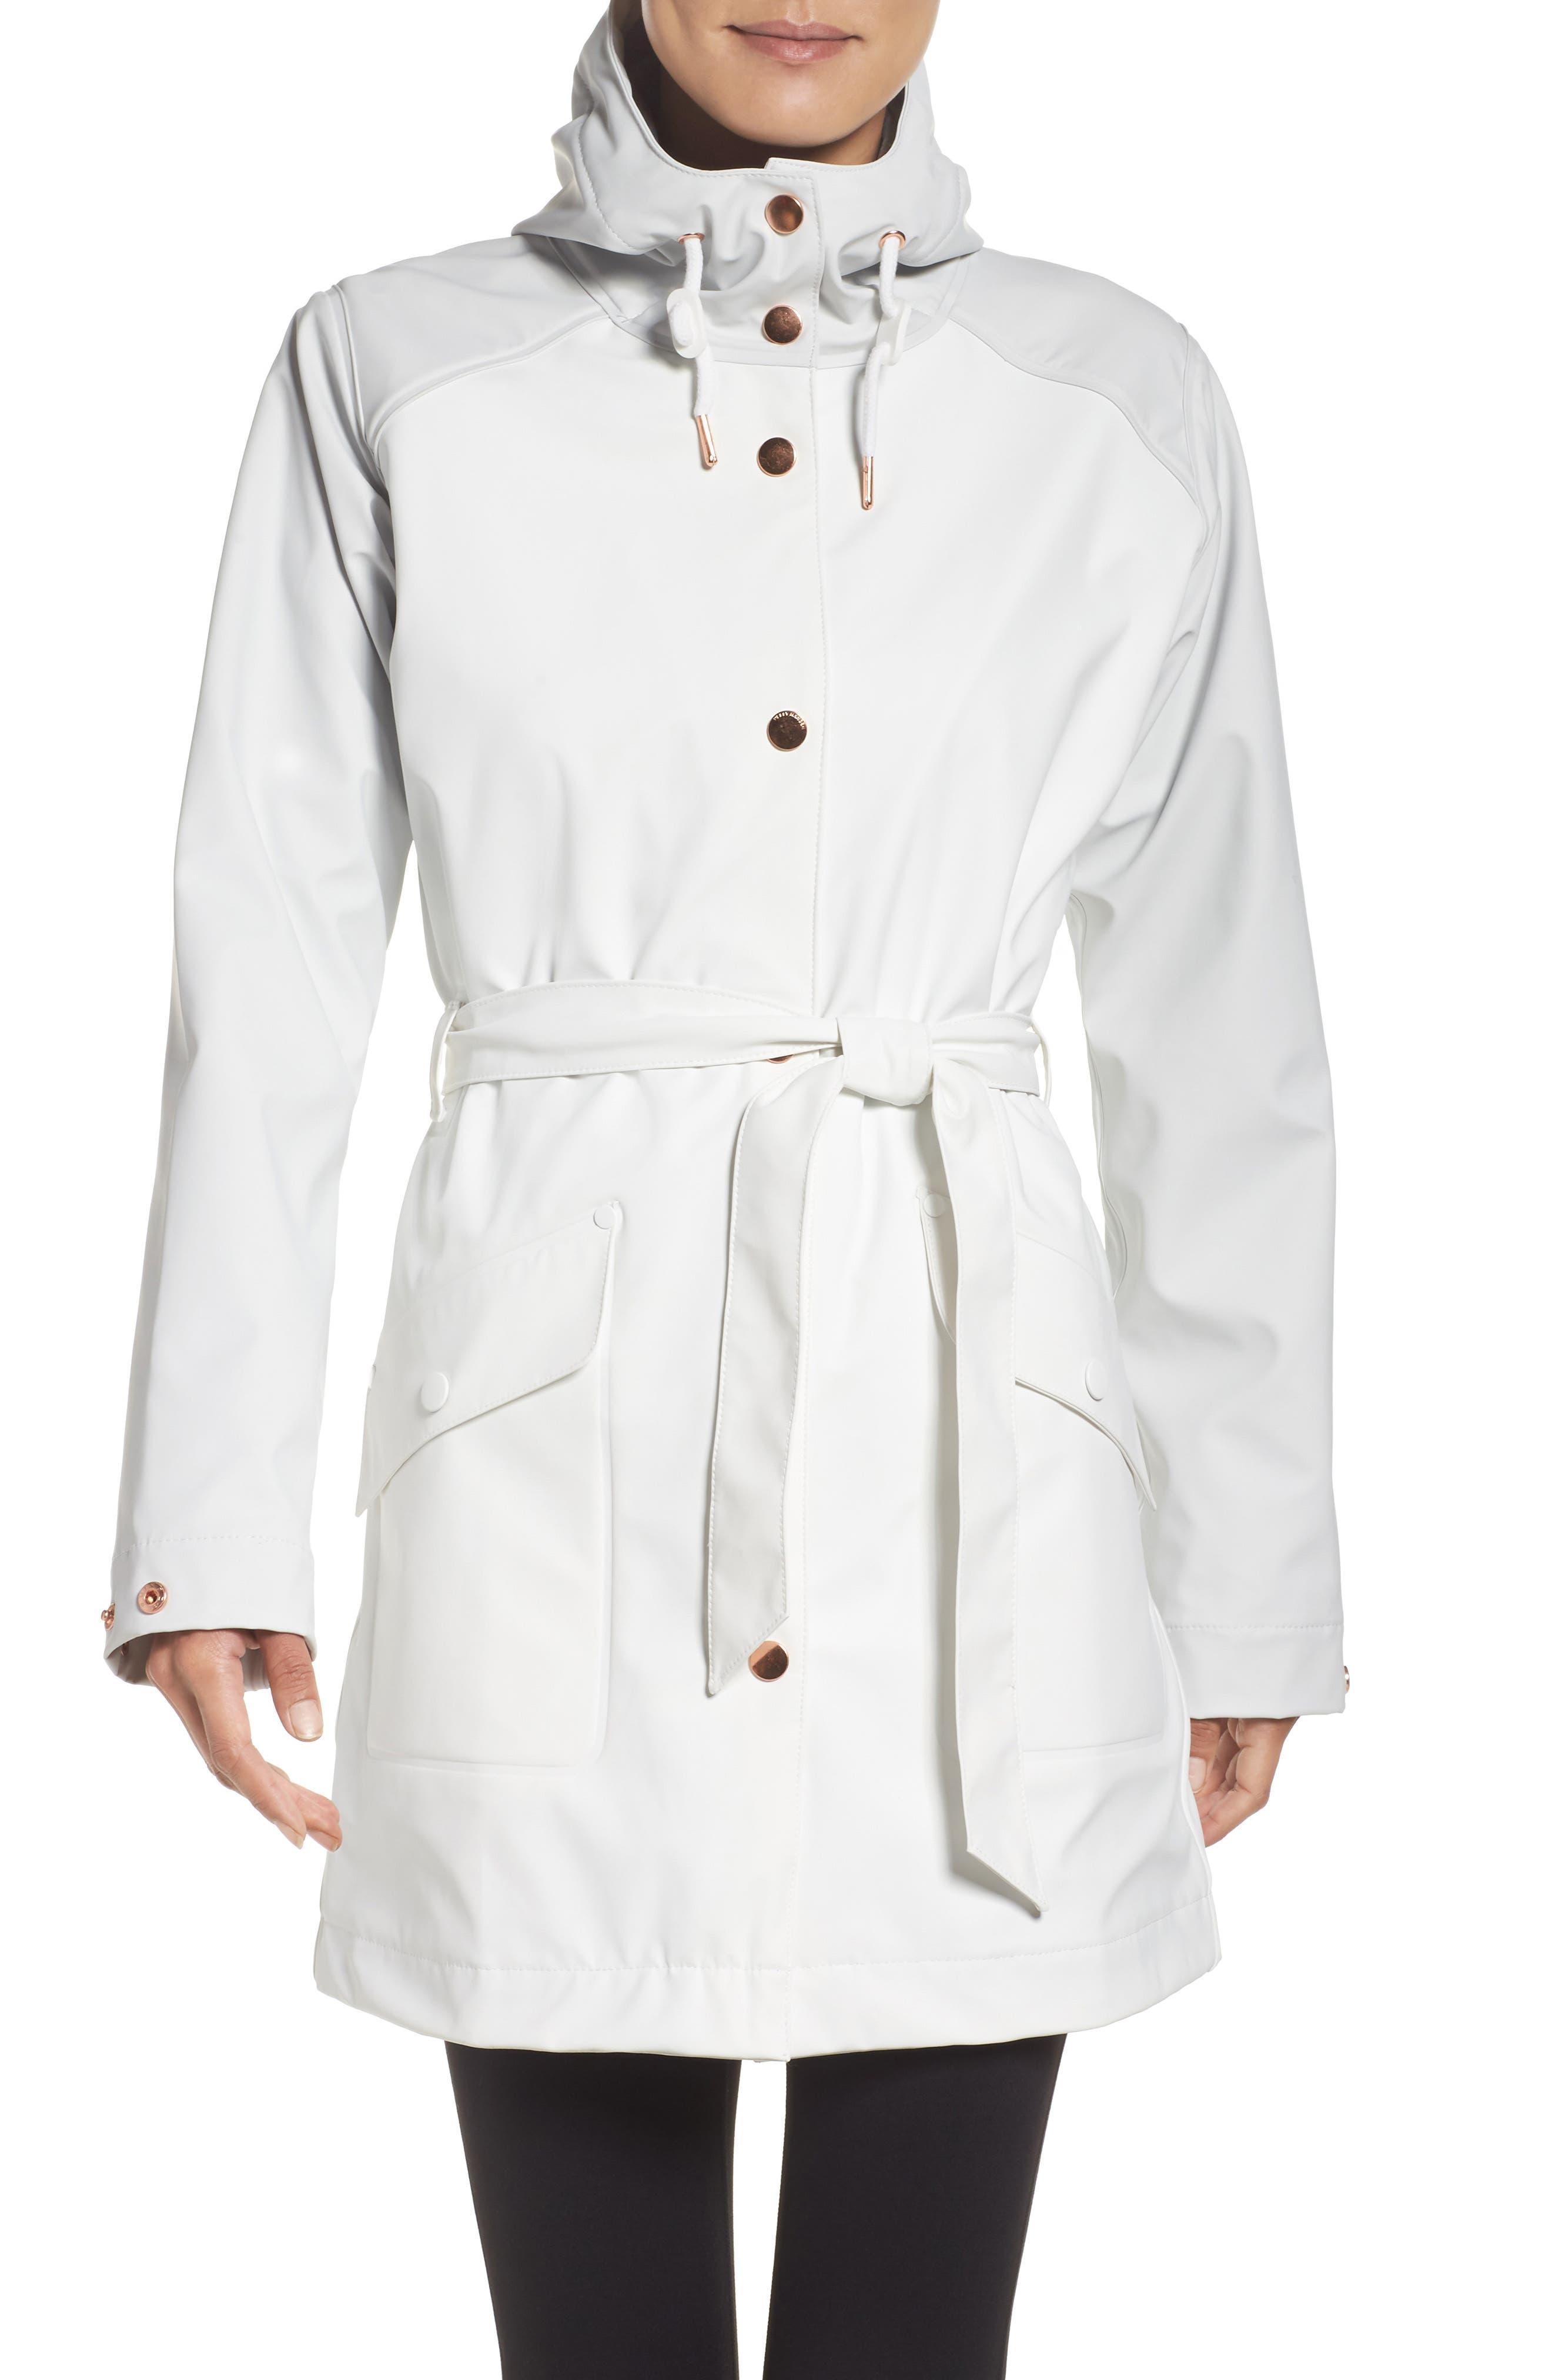 Main Image - Helly Hansen Kirkwall Raincoat